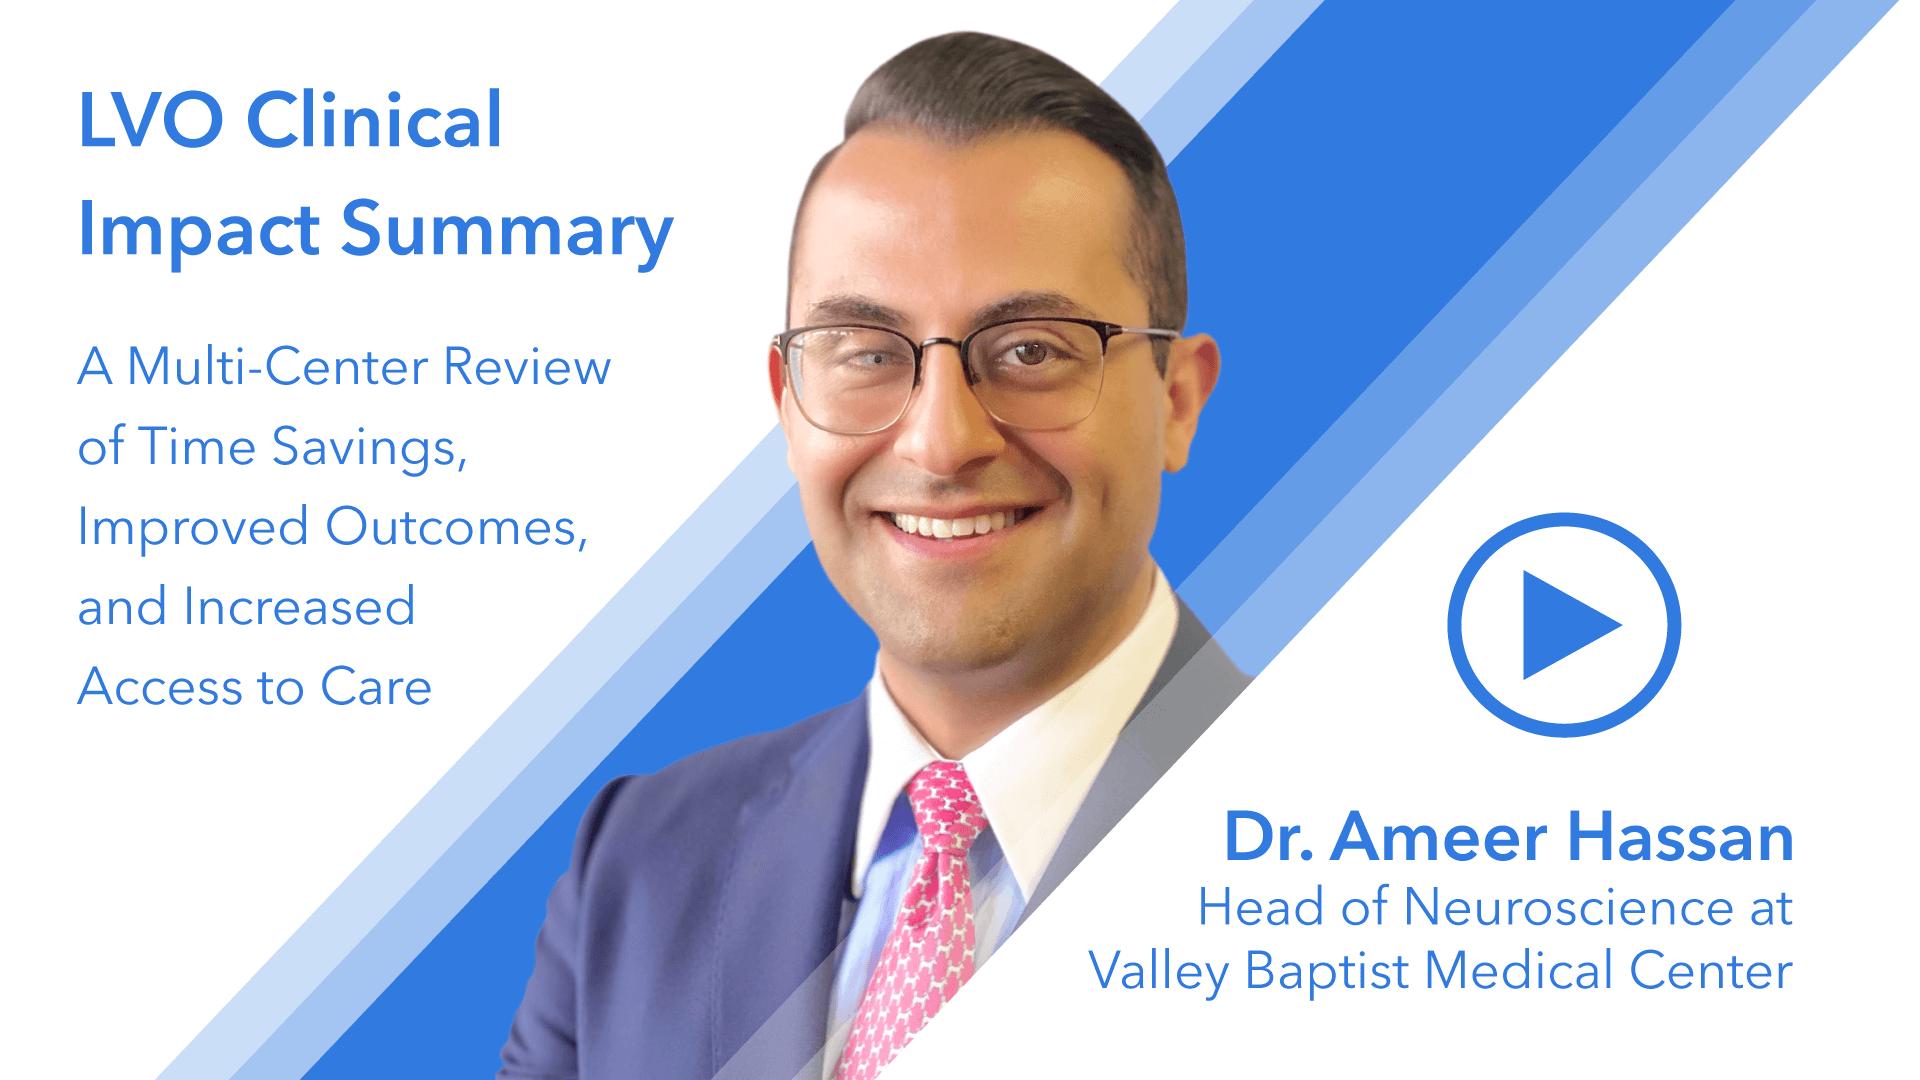 LVO Clinical Impact Summary